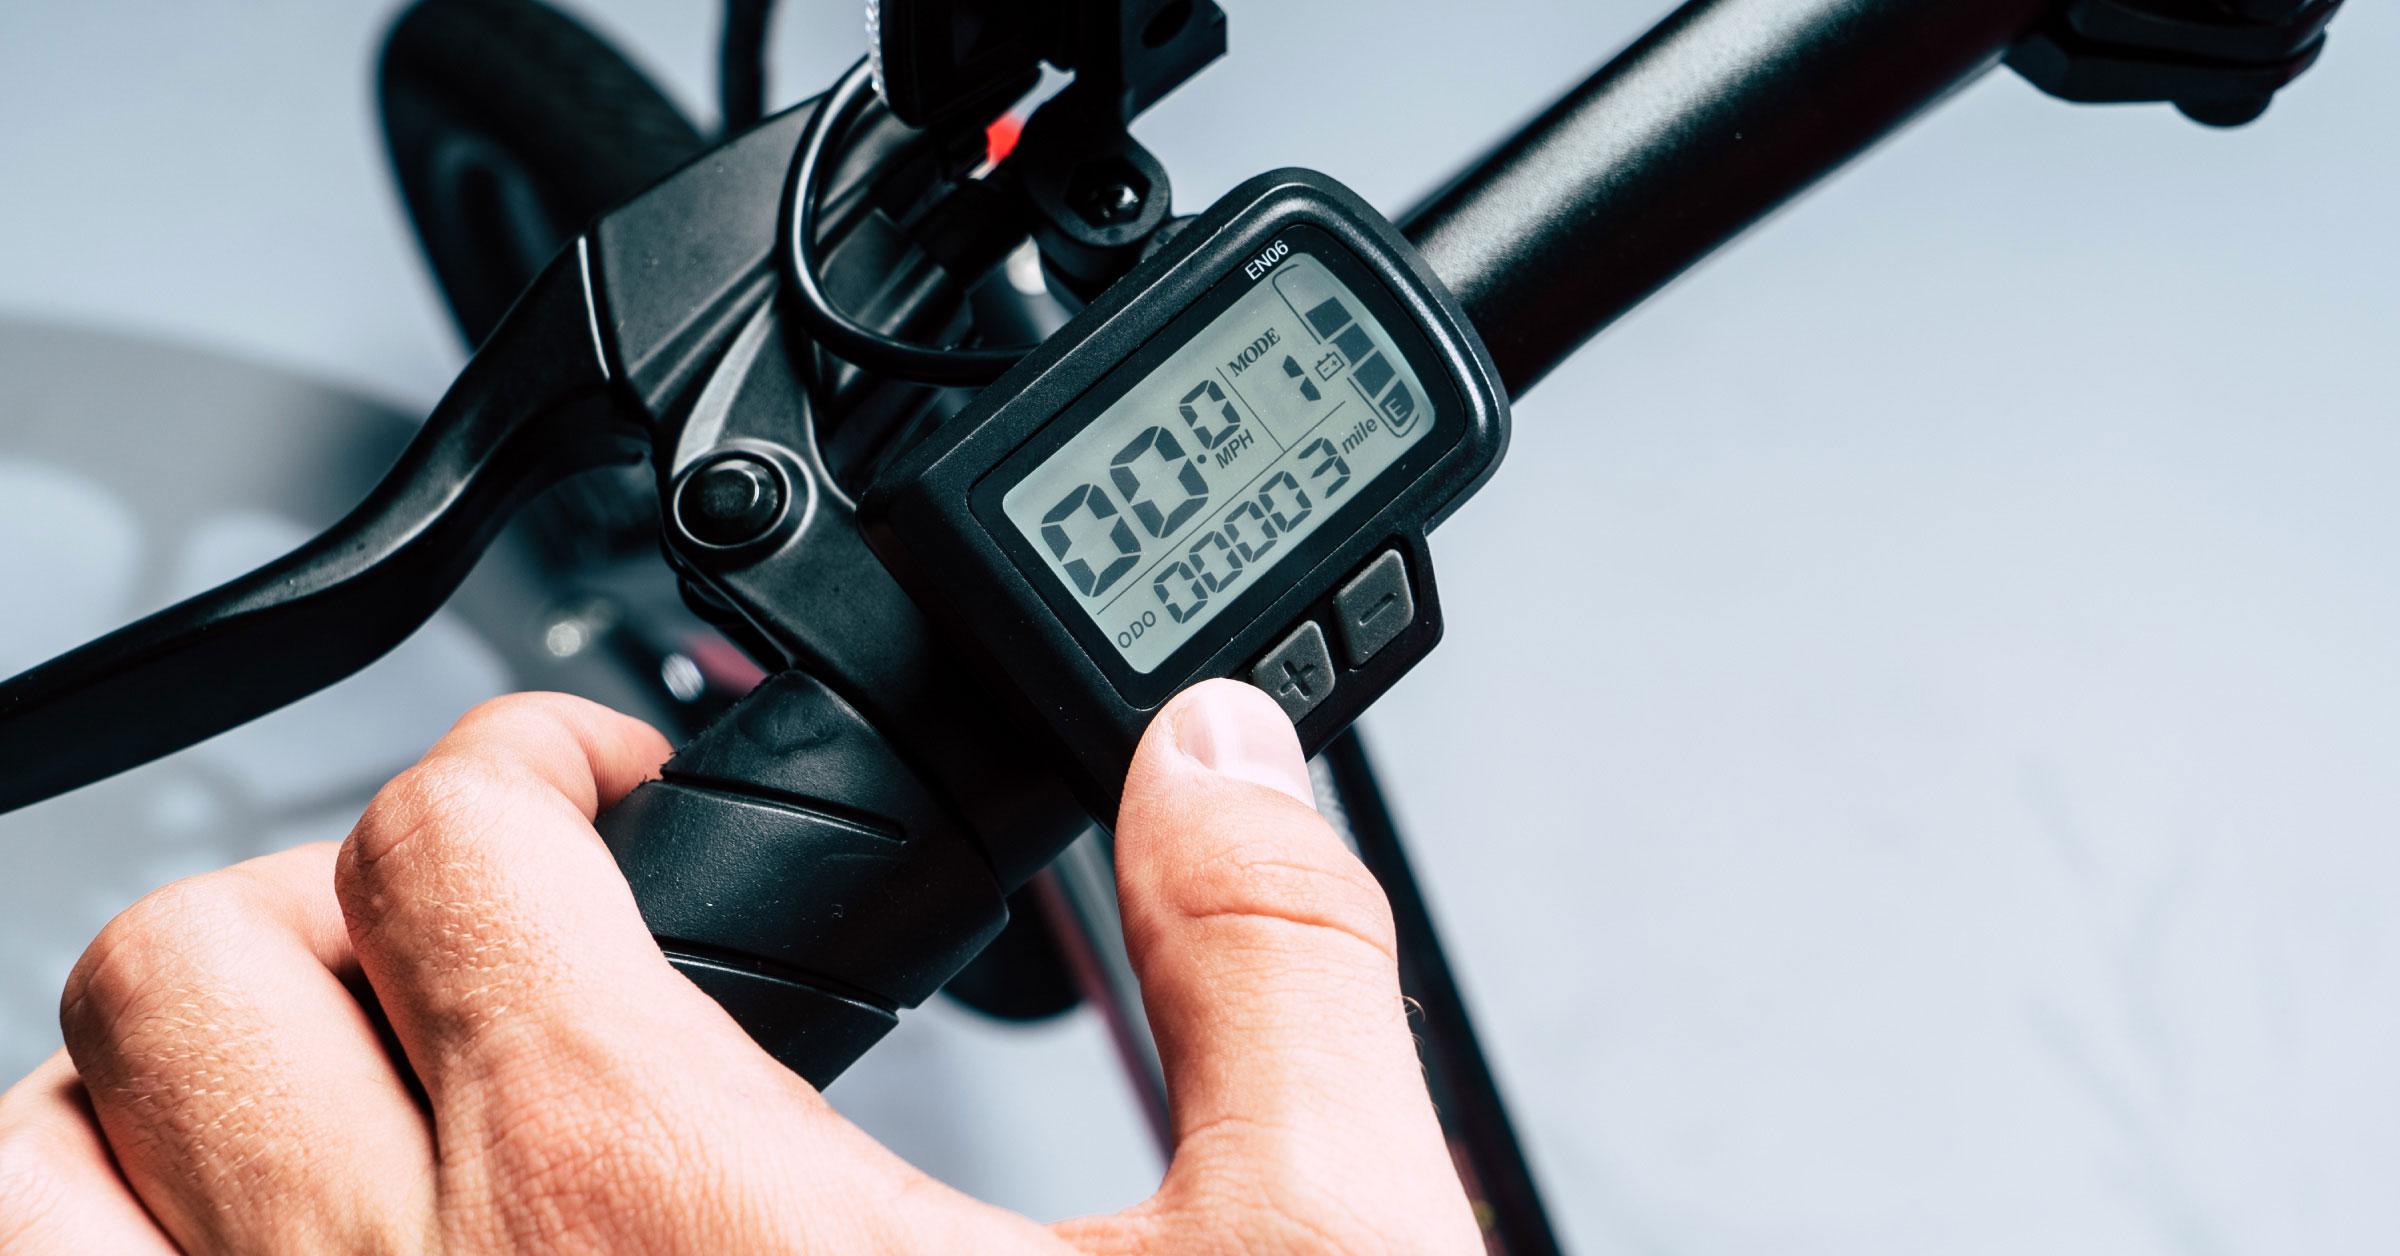 What Electric Bike Has The Longest Range Swagtron